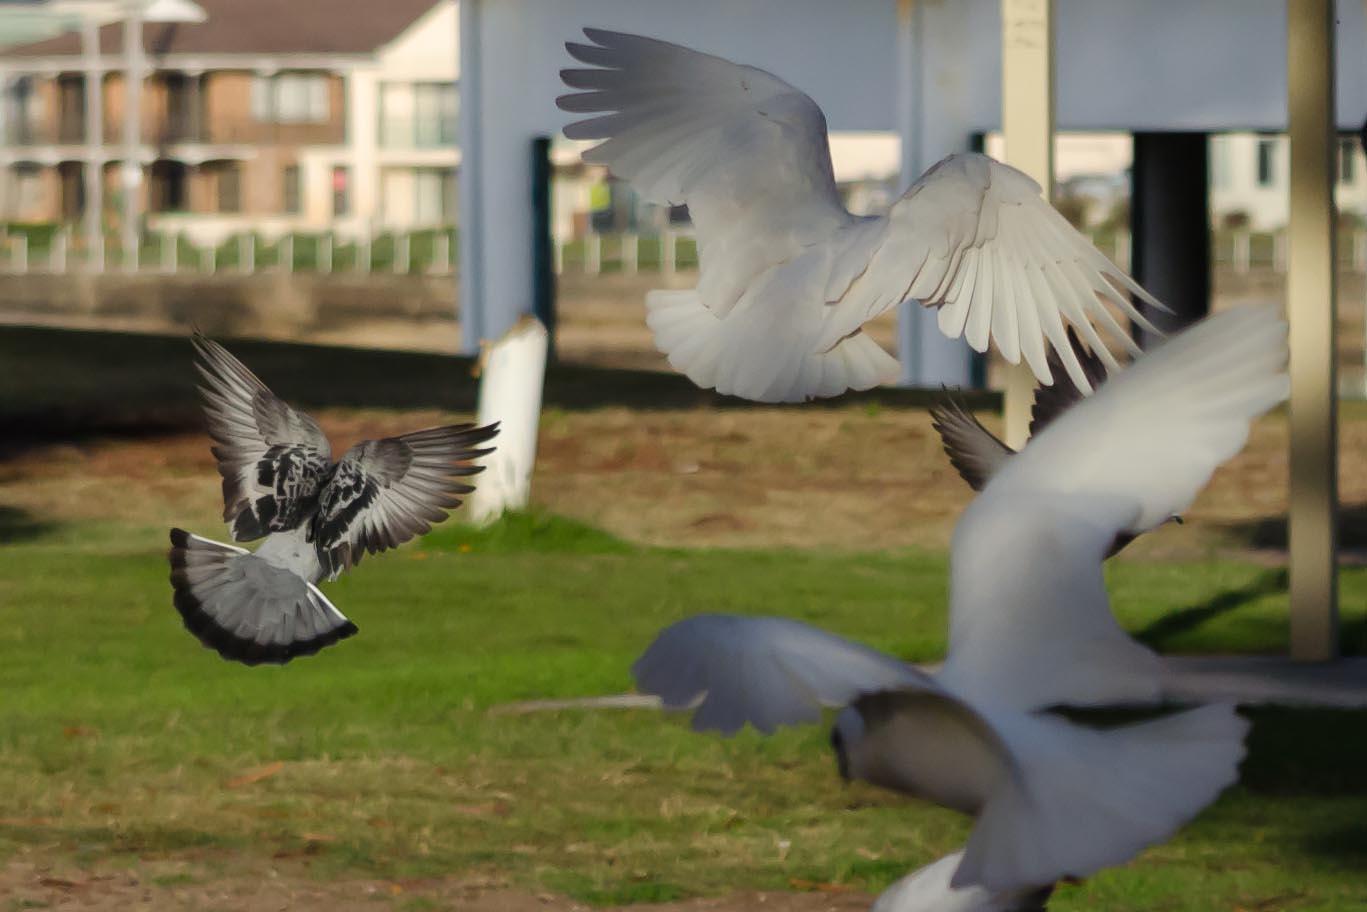 Corella, corellas, birds, bird, feed, eating, fly, wings, pigeon